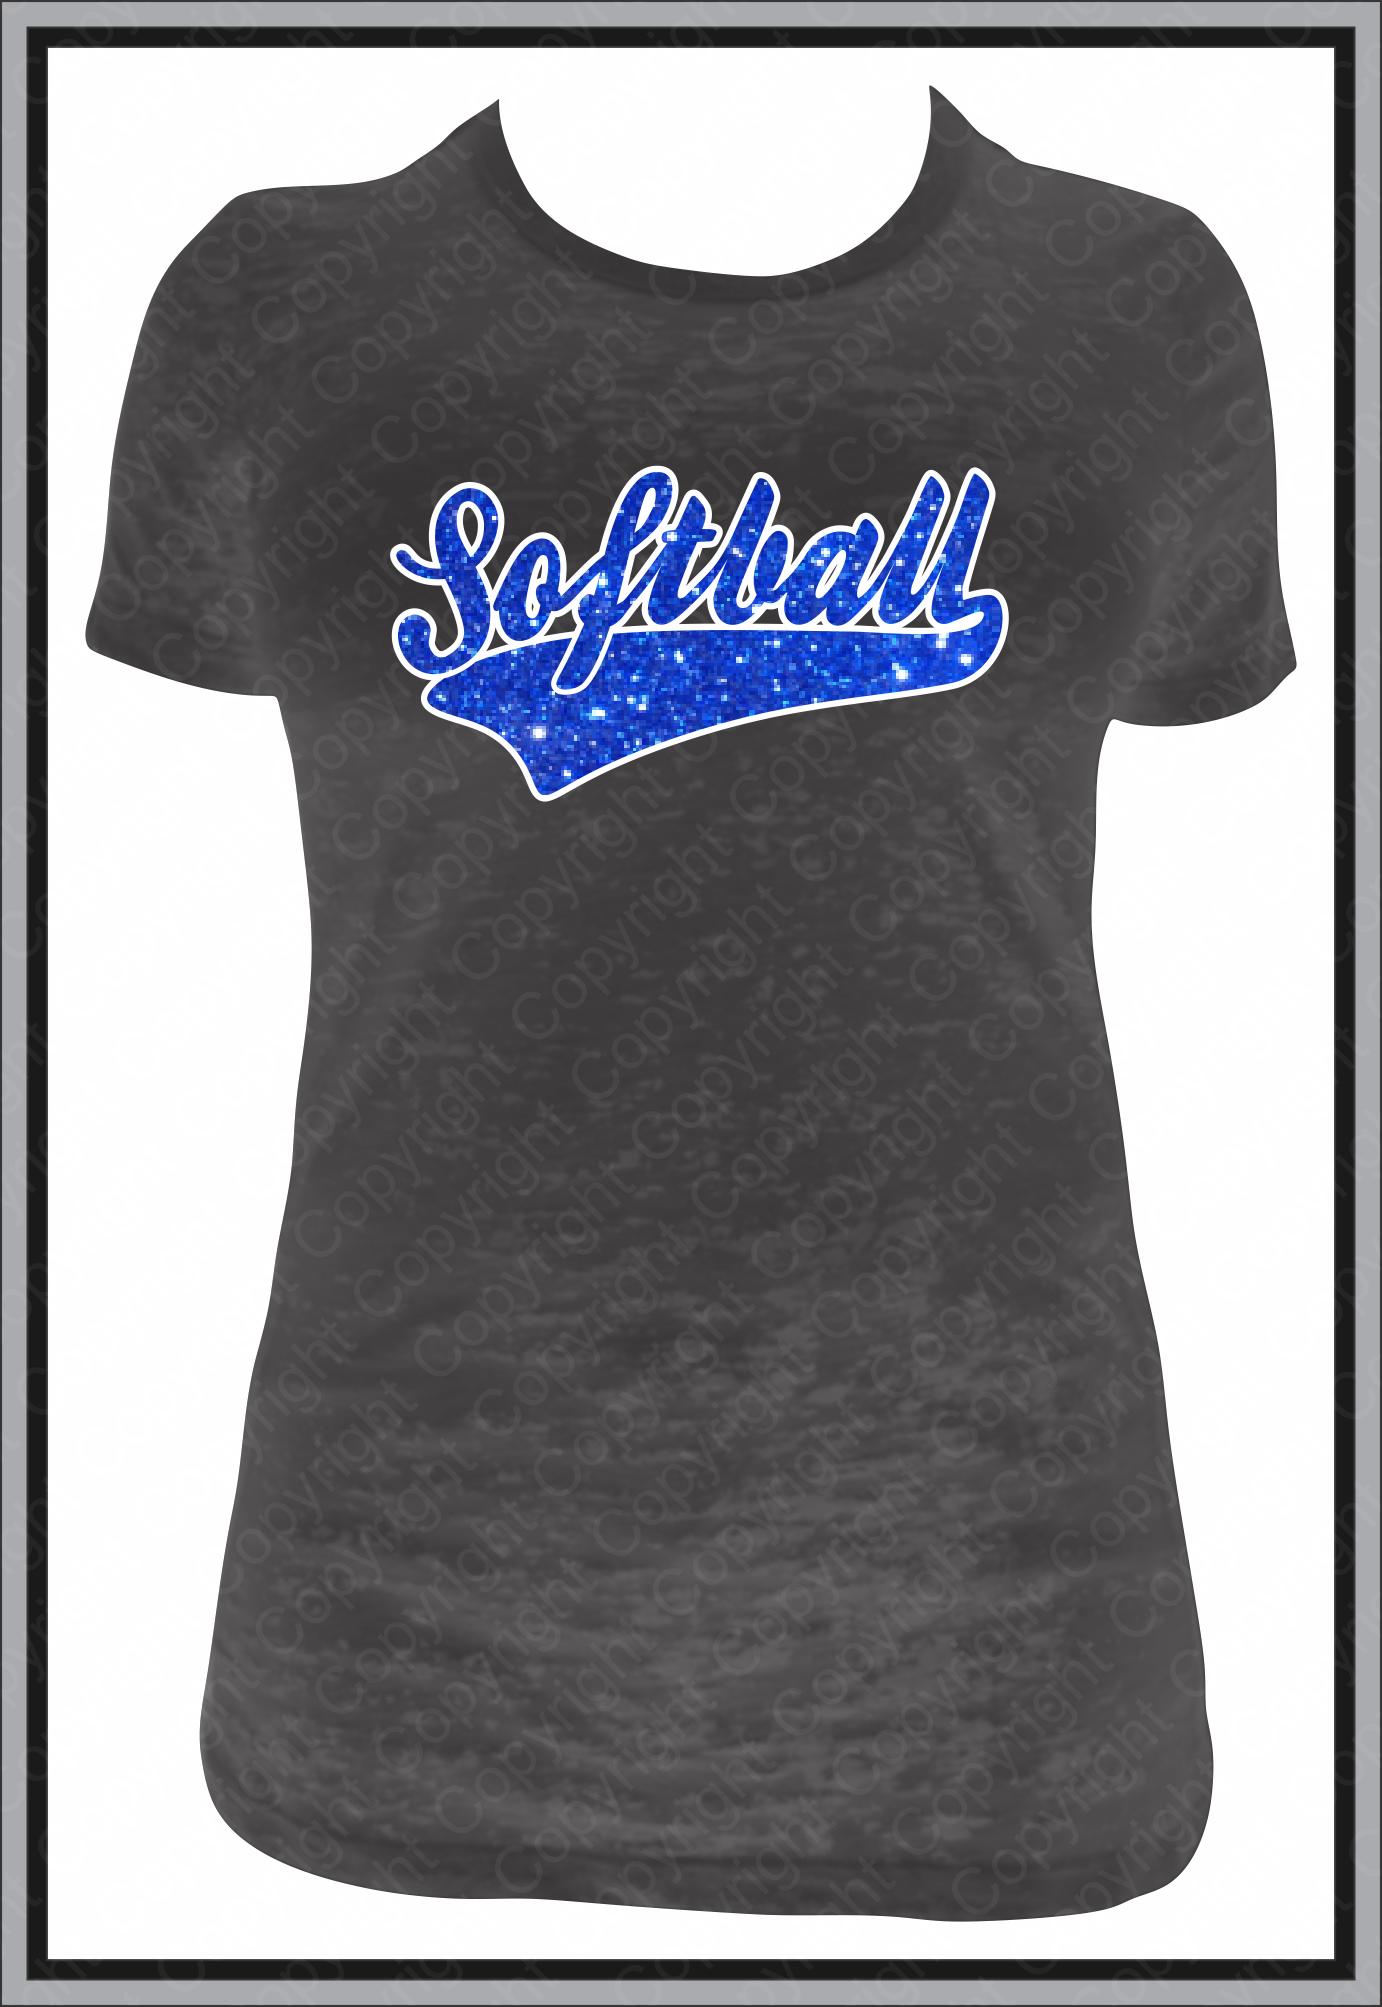 TRW Softball Tail 2 mock.png